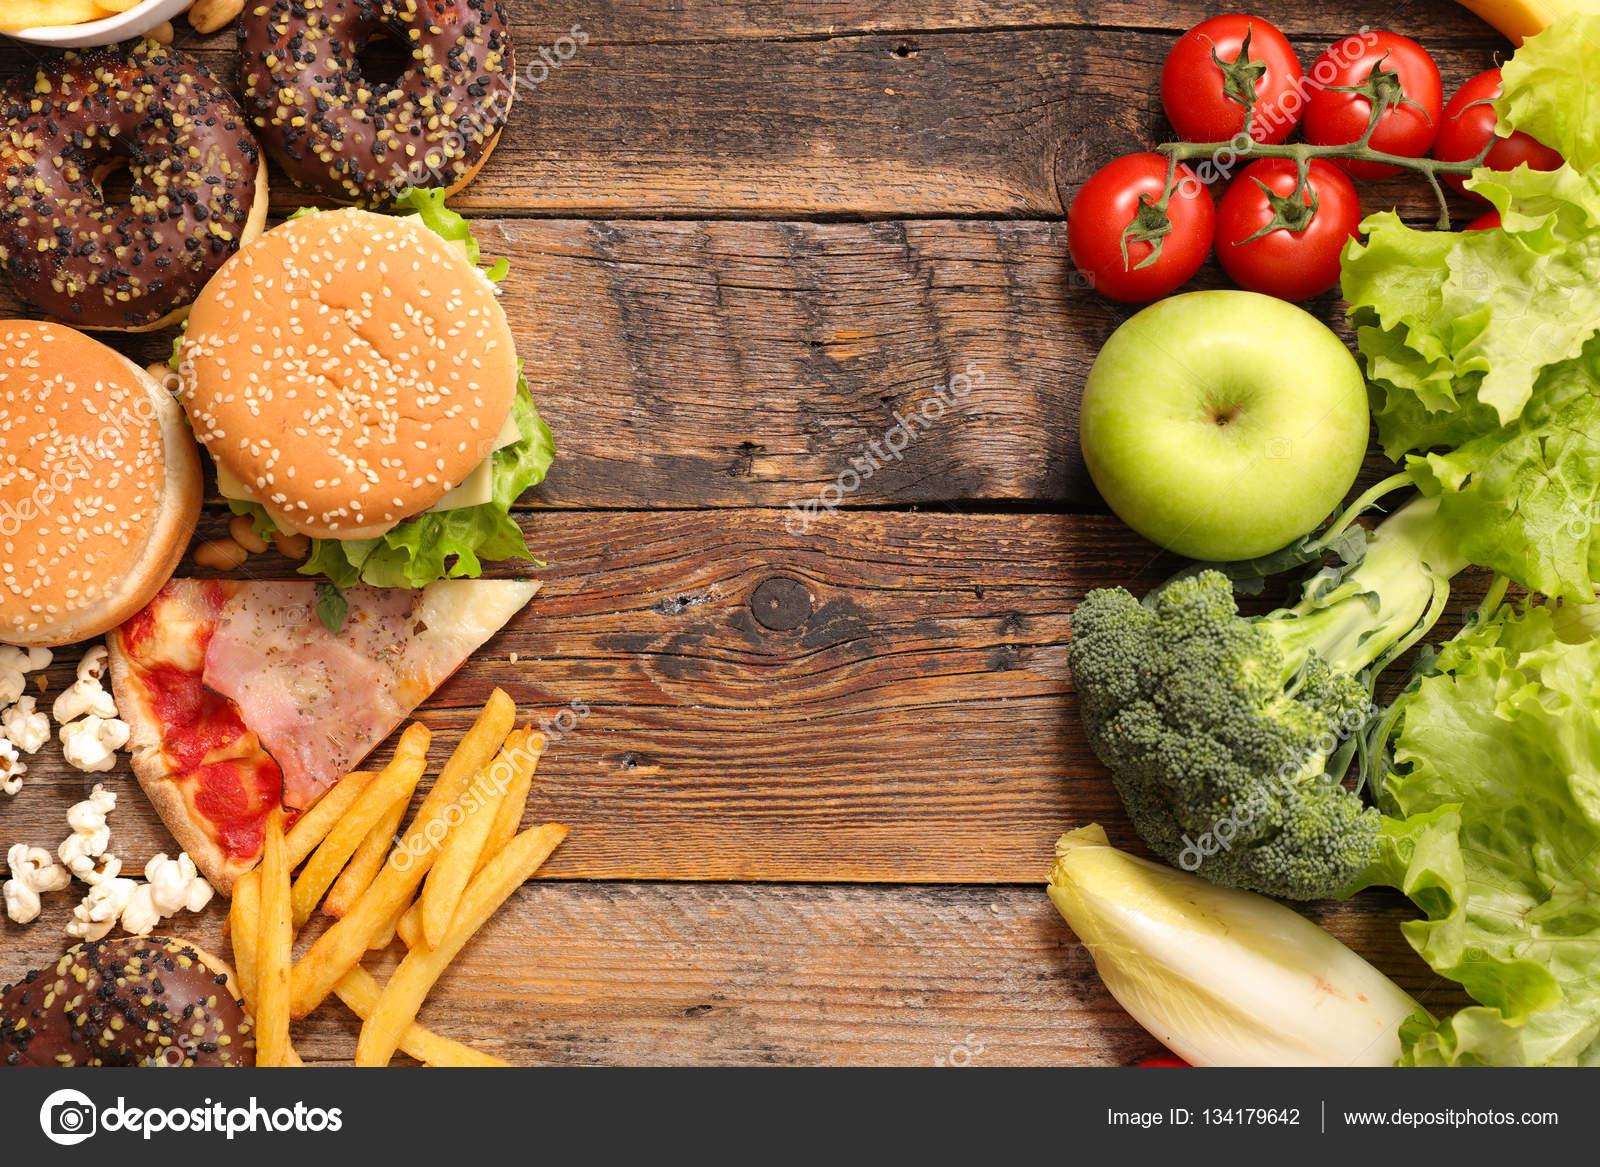 organic vs inorganic foods essay example